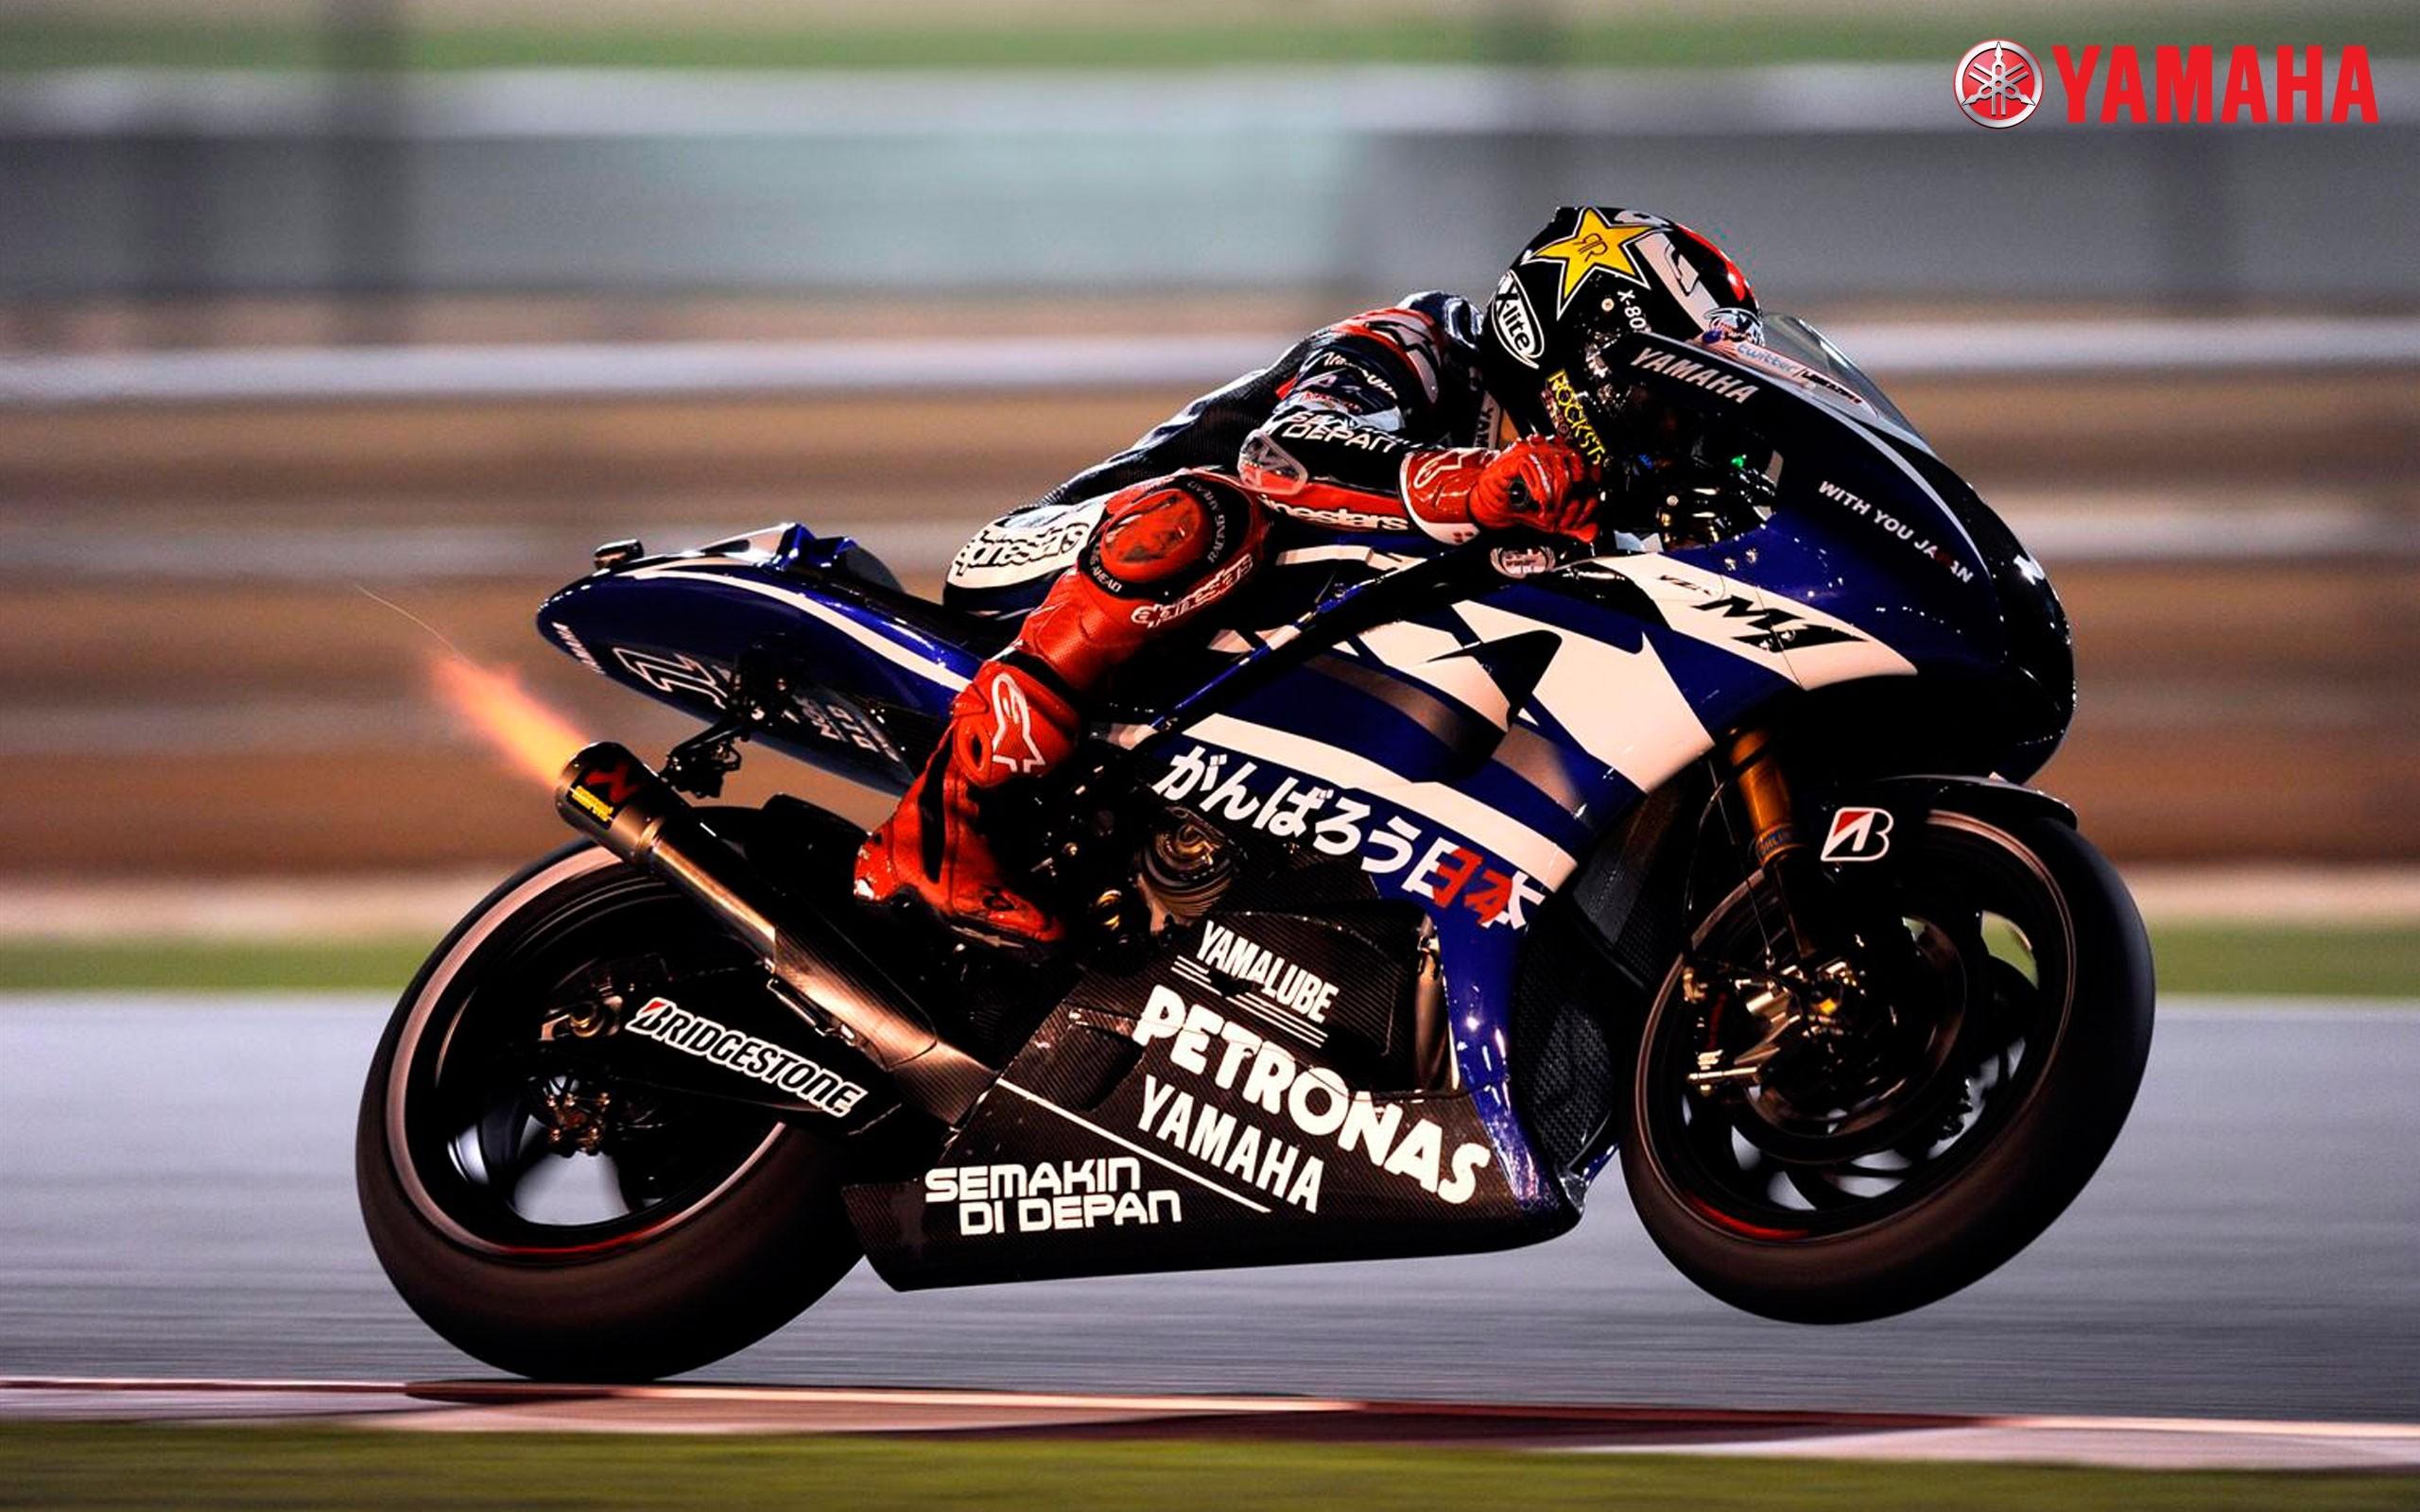 Jorge Lorenzo Wallpapers MotoGp. Jorge Lorenzo Yamaha Movistar